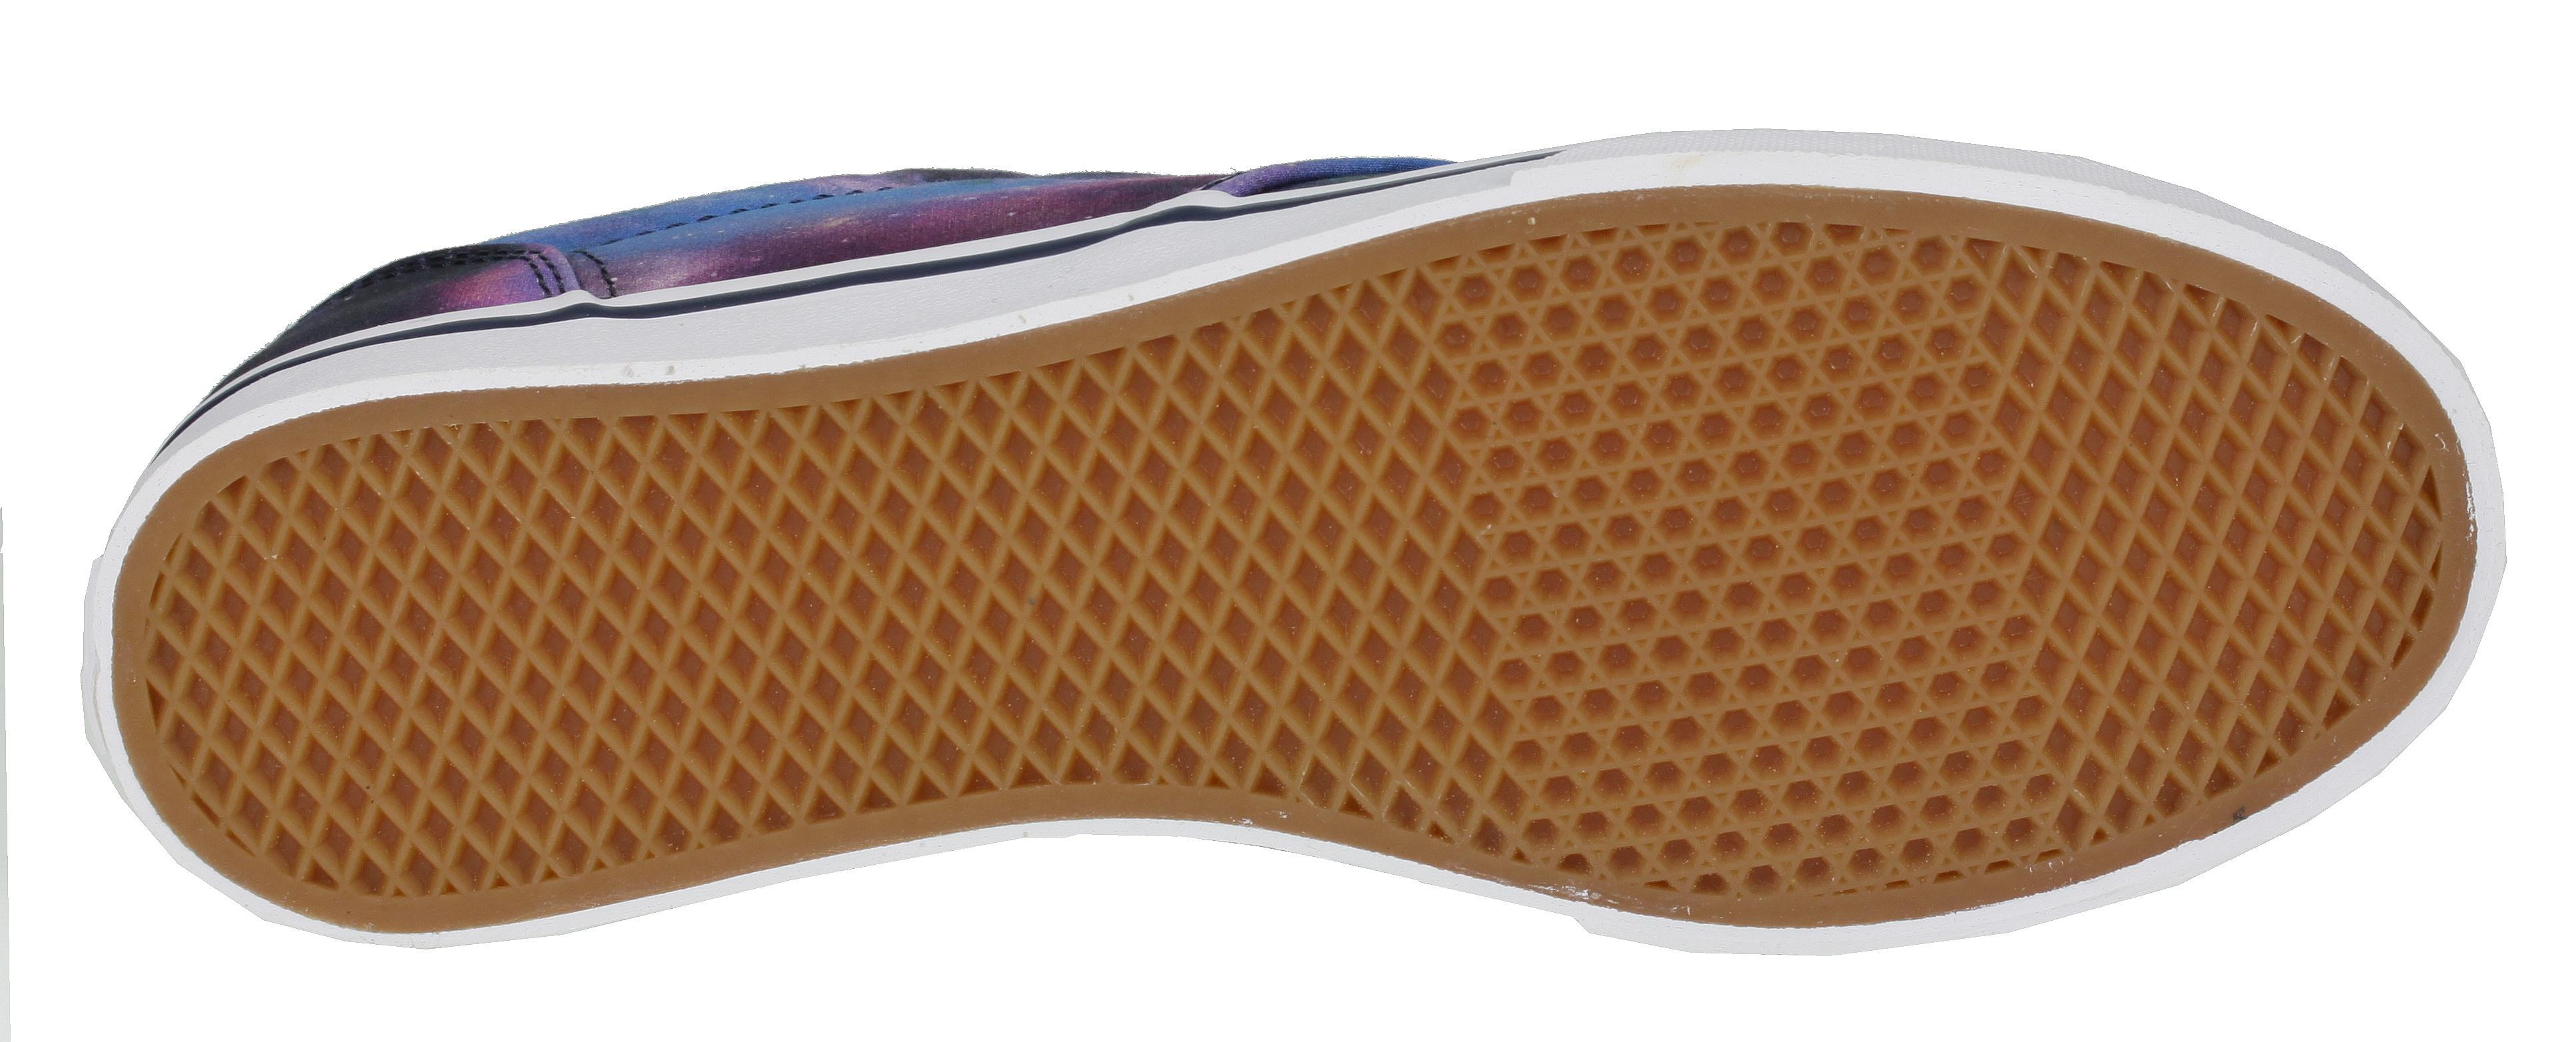 f96cc0d50 topánky Vans Atwood Low - Cosmic Galaxy - Snowboard shop, skateshop ...